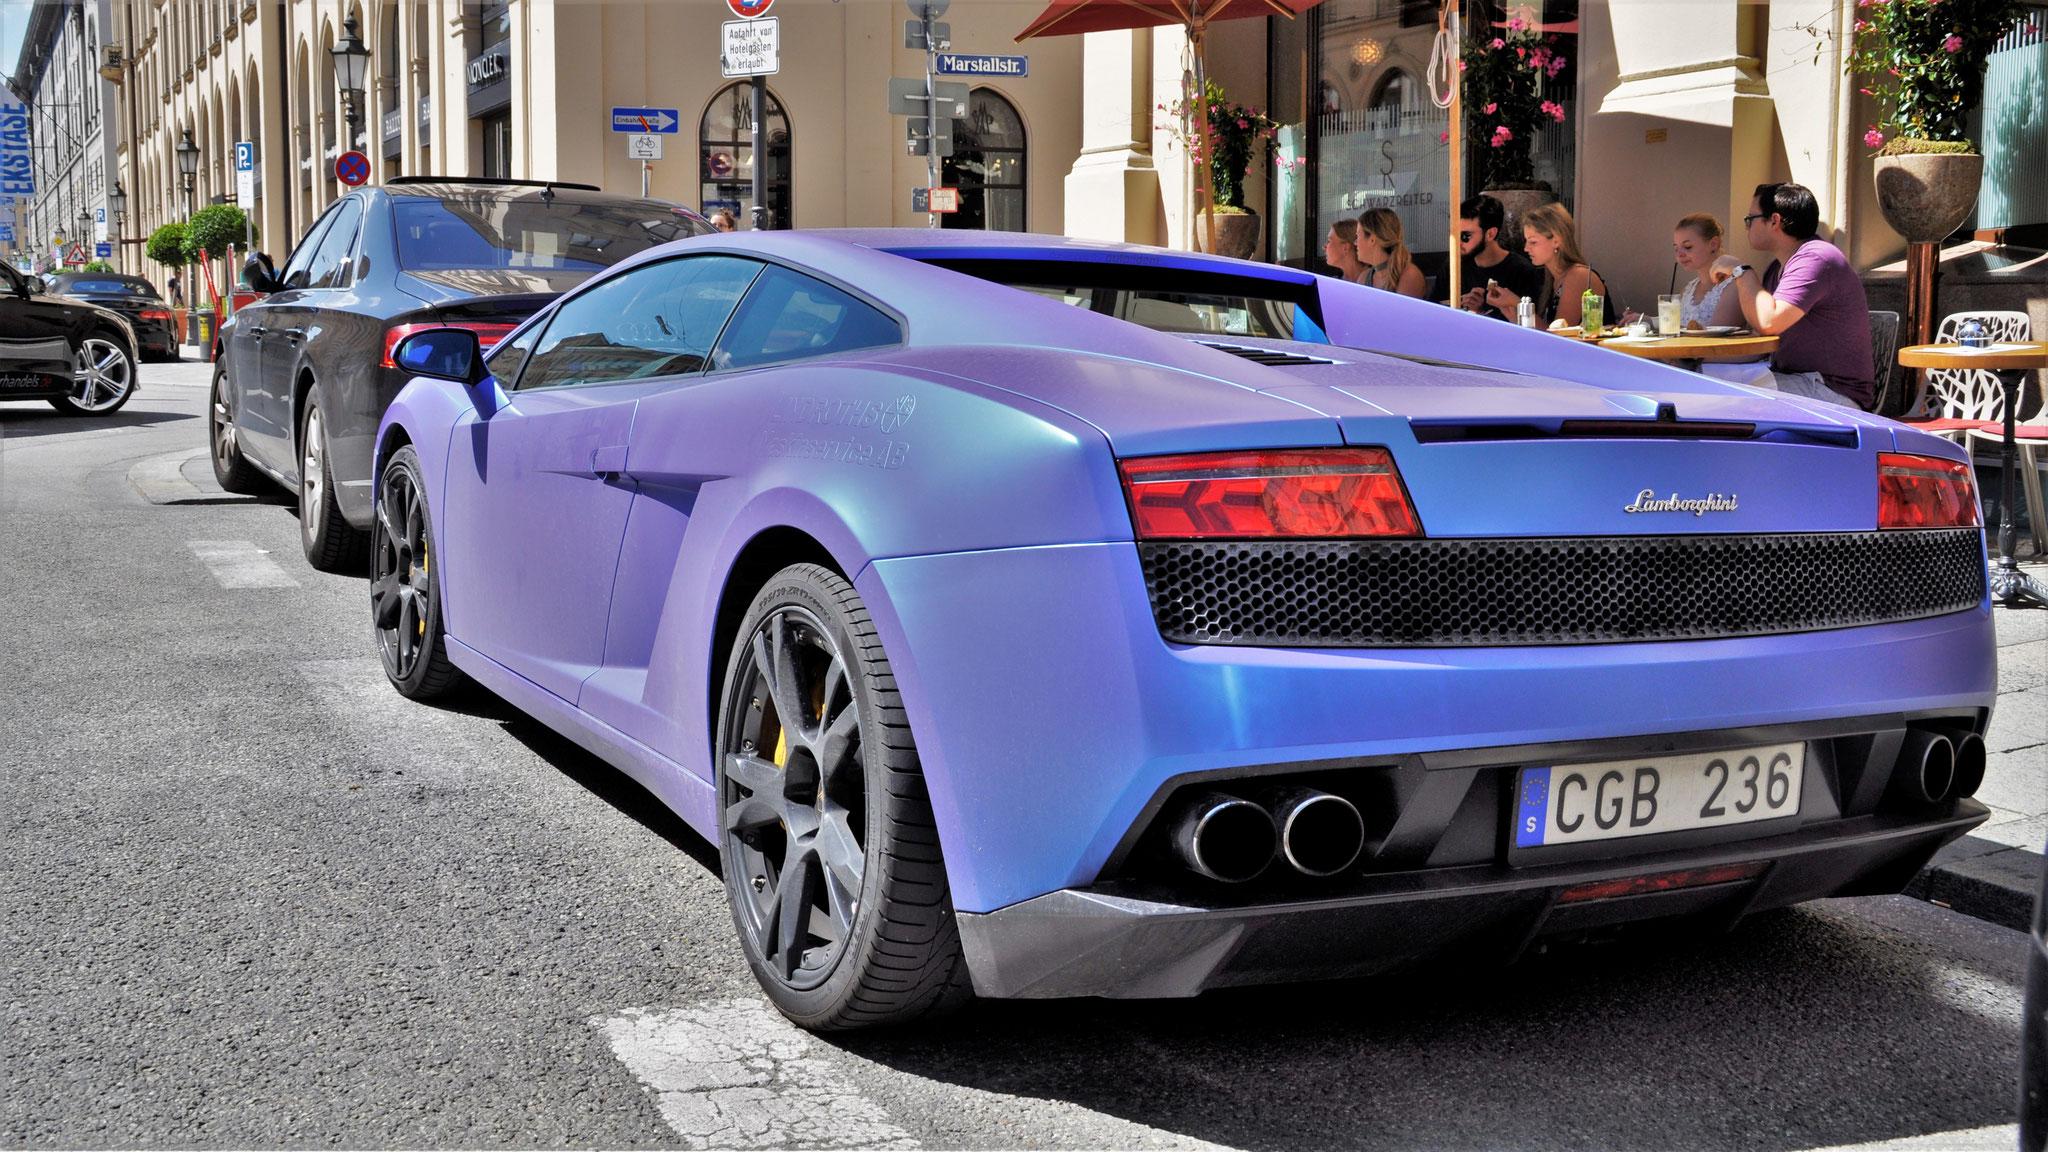 Lamborghini Gallardo LP 550 - CB-236 (SWE)